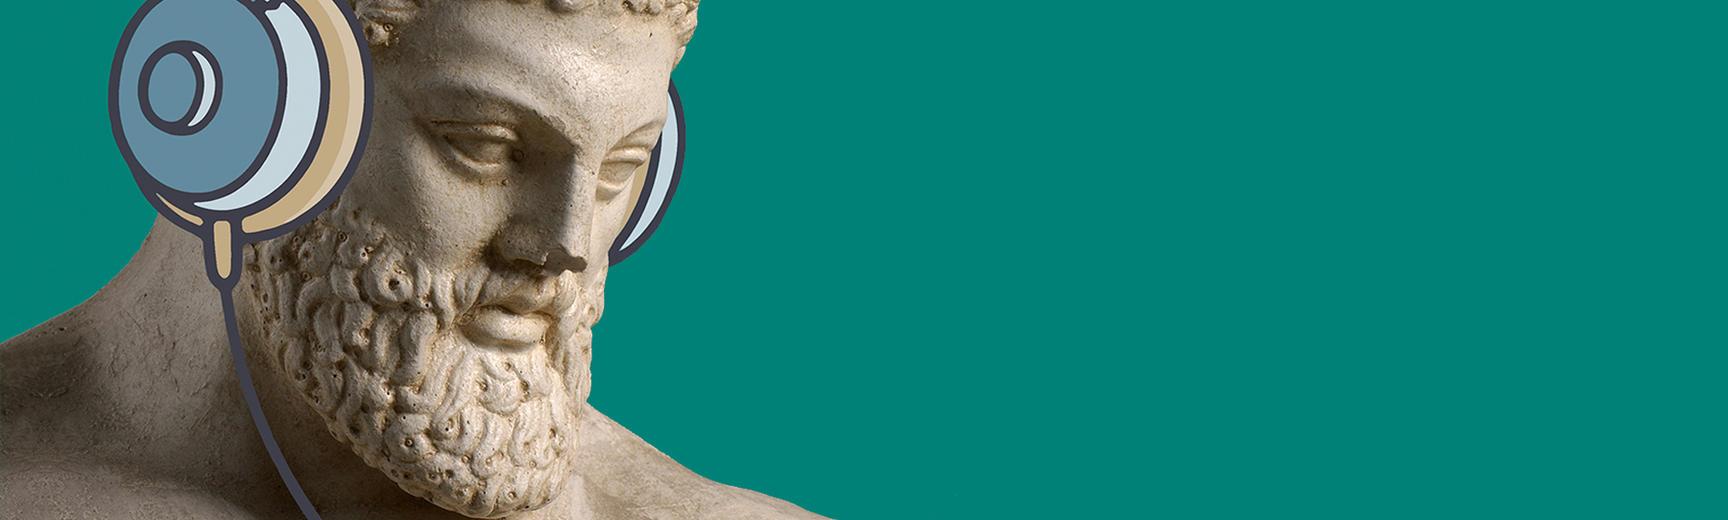 museum secrets podcast headphones banner